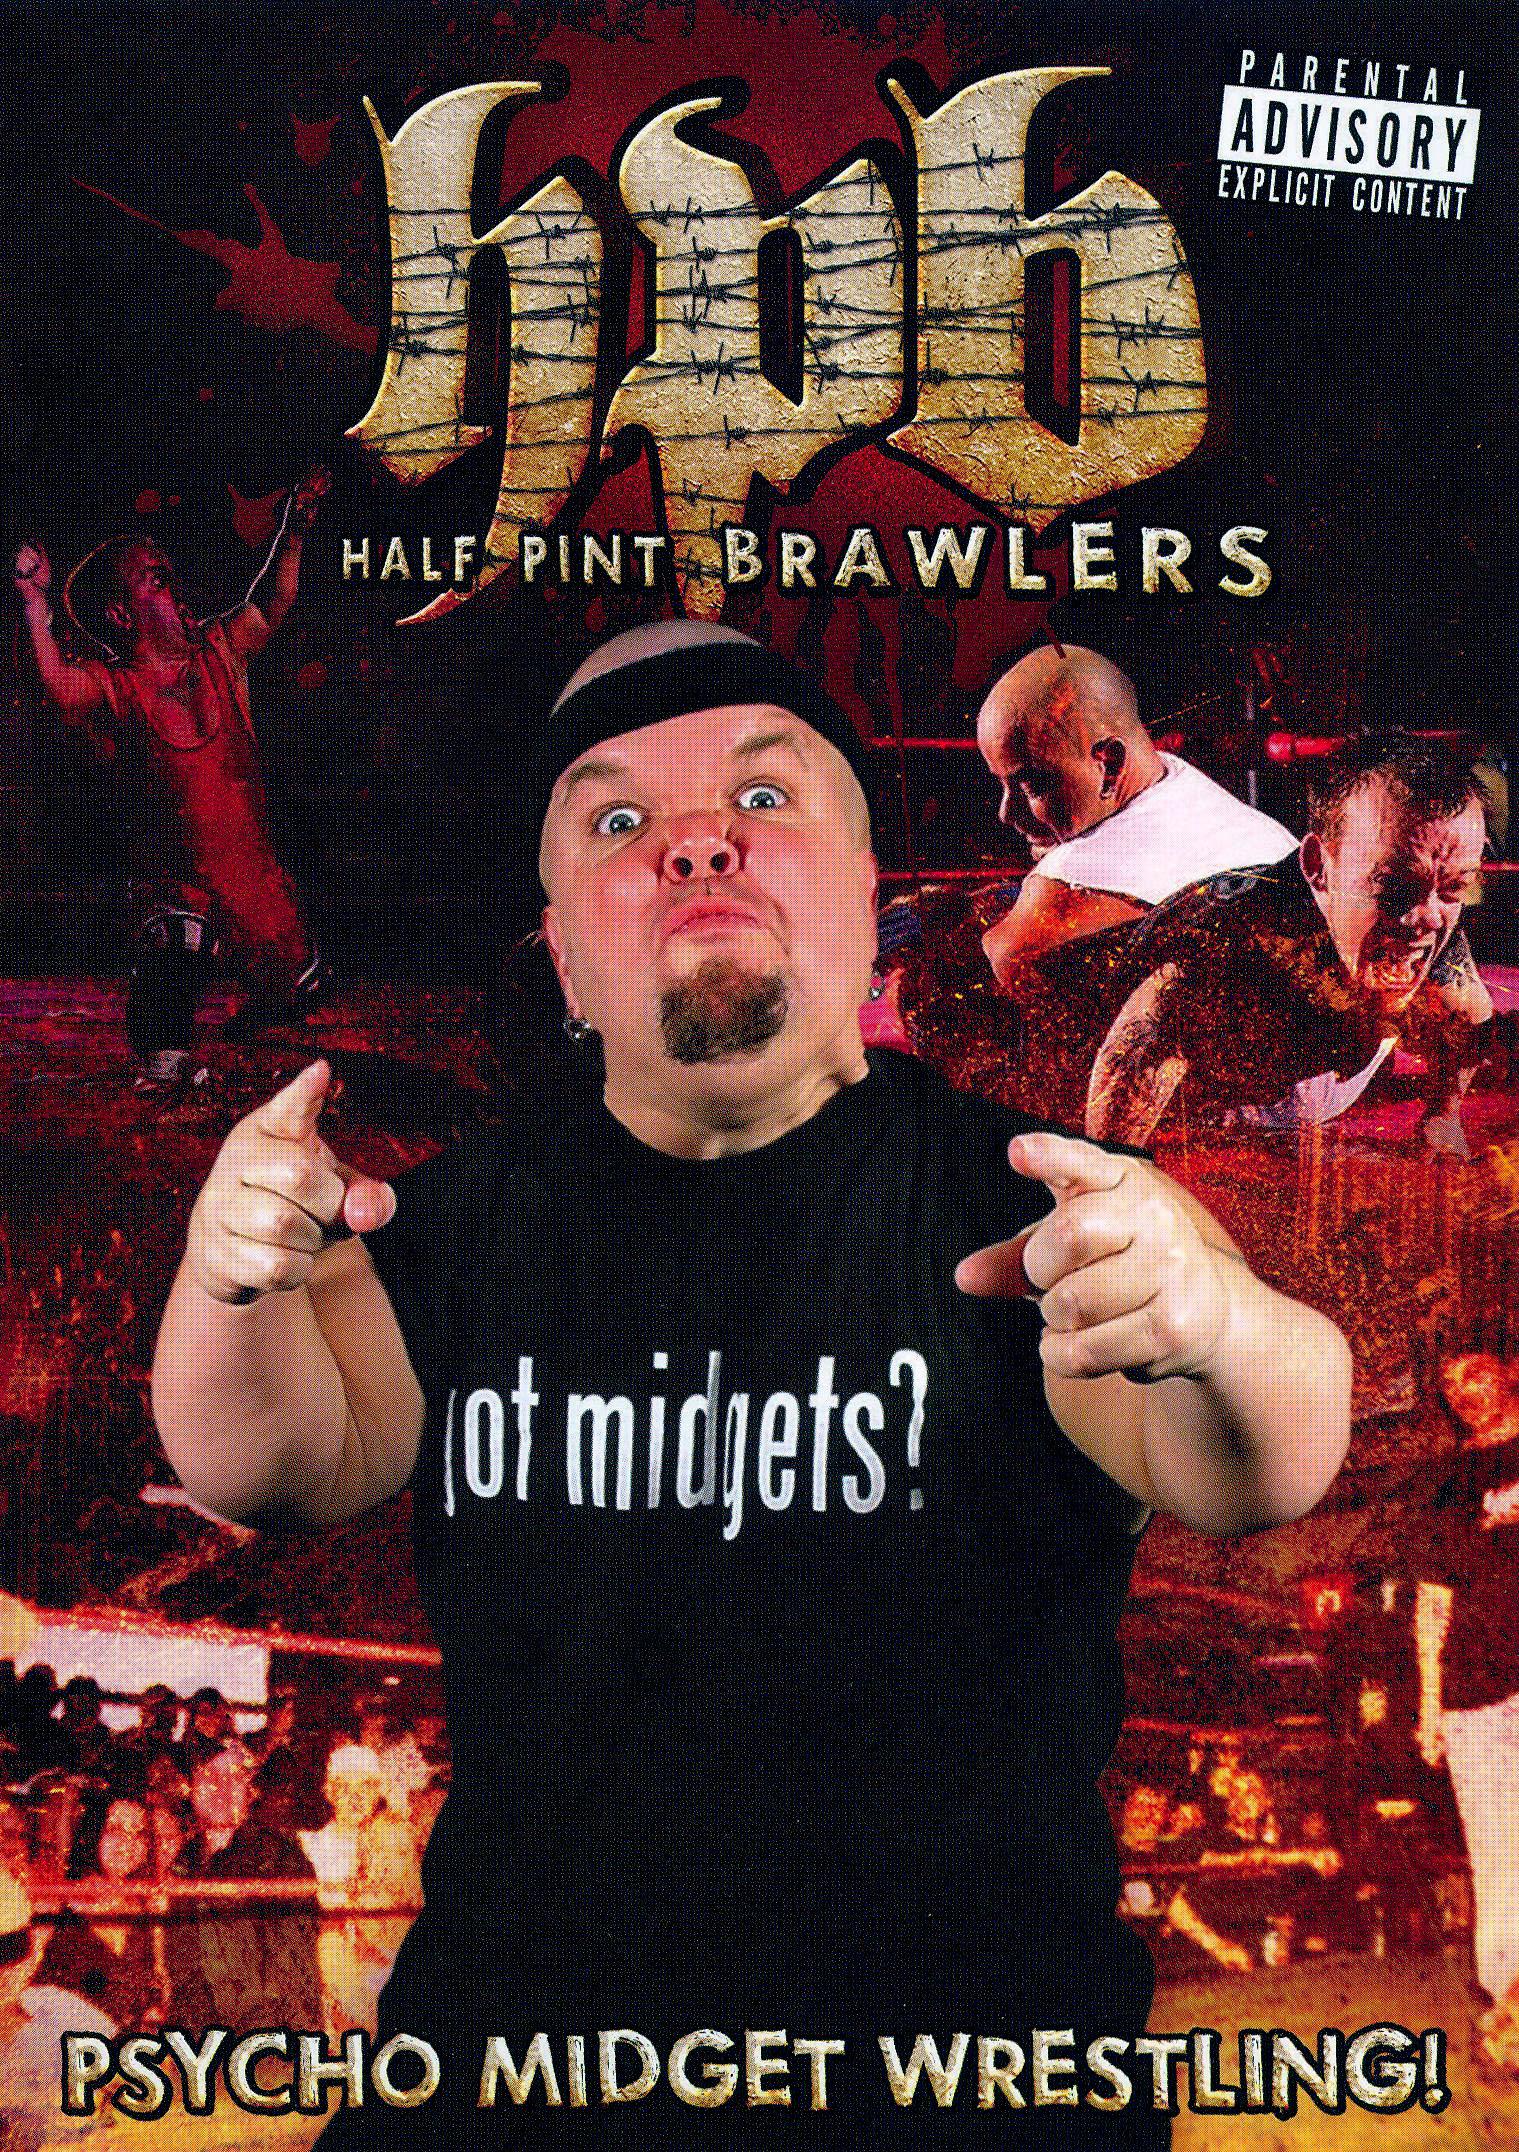 Half Pint Brawlers: Psycho Midget Wrestling